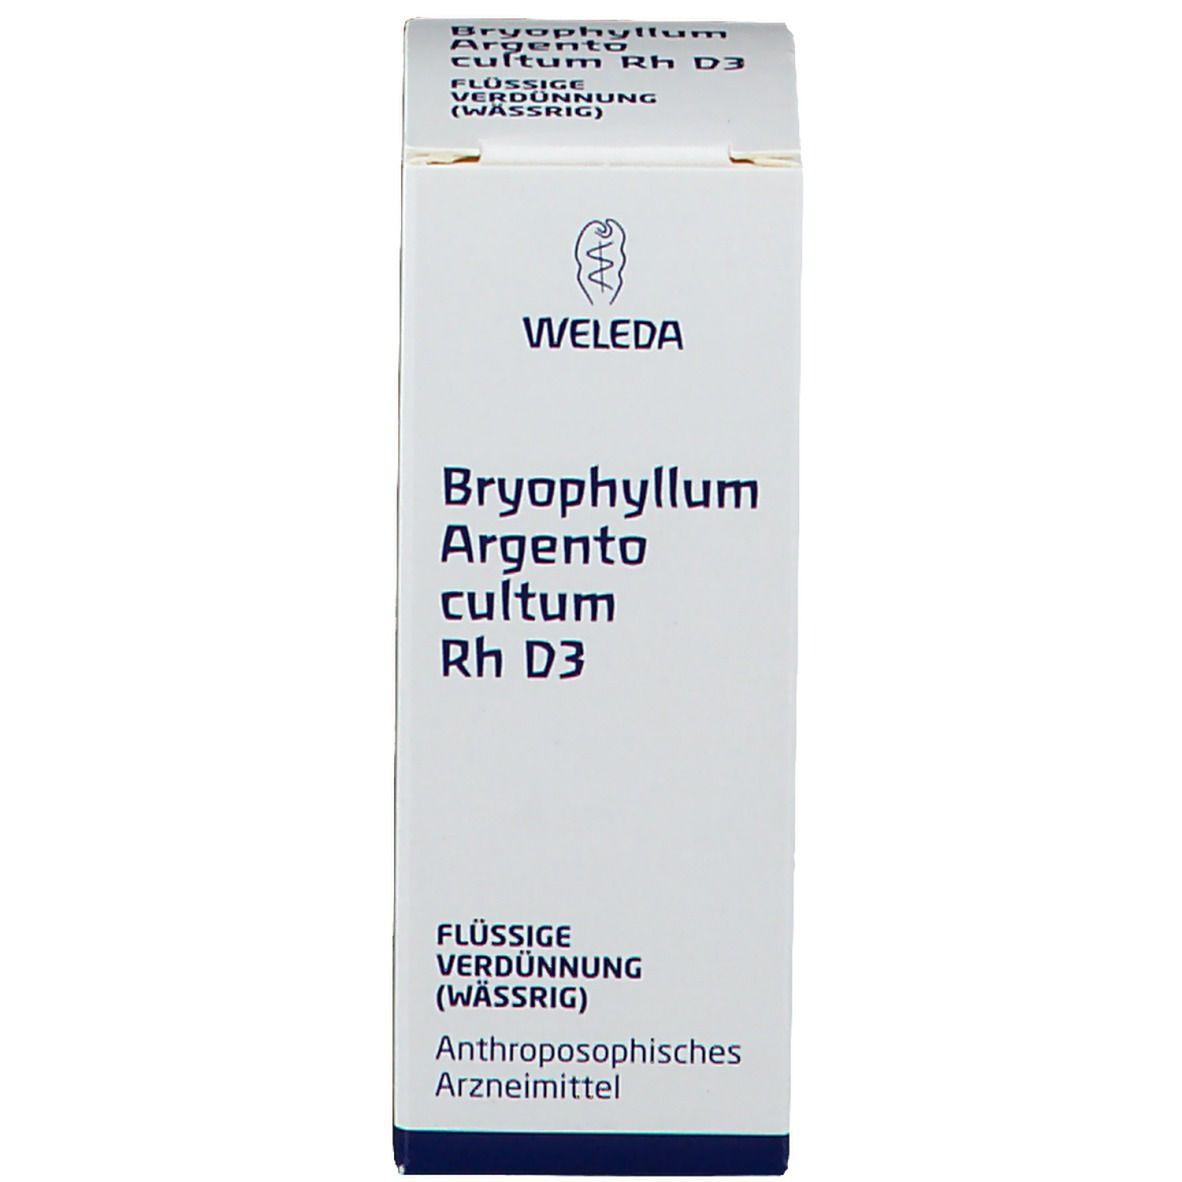 Weleda Byophyllum Argento cultum Rh D3